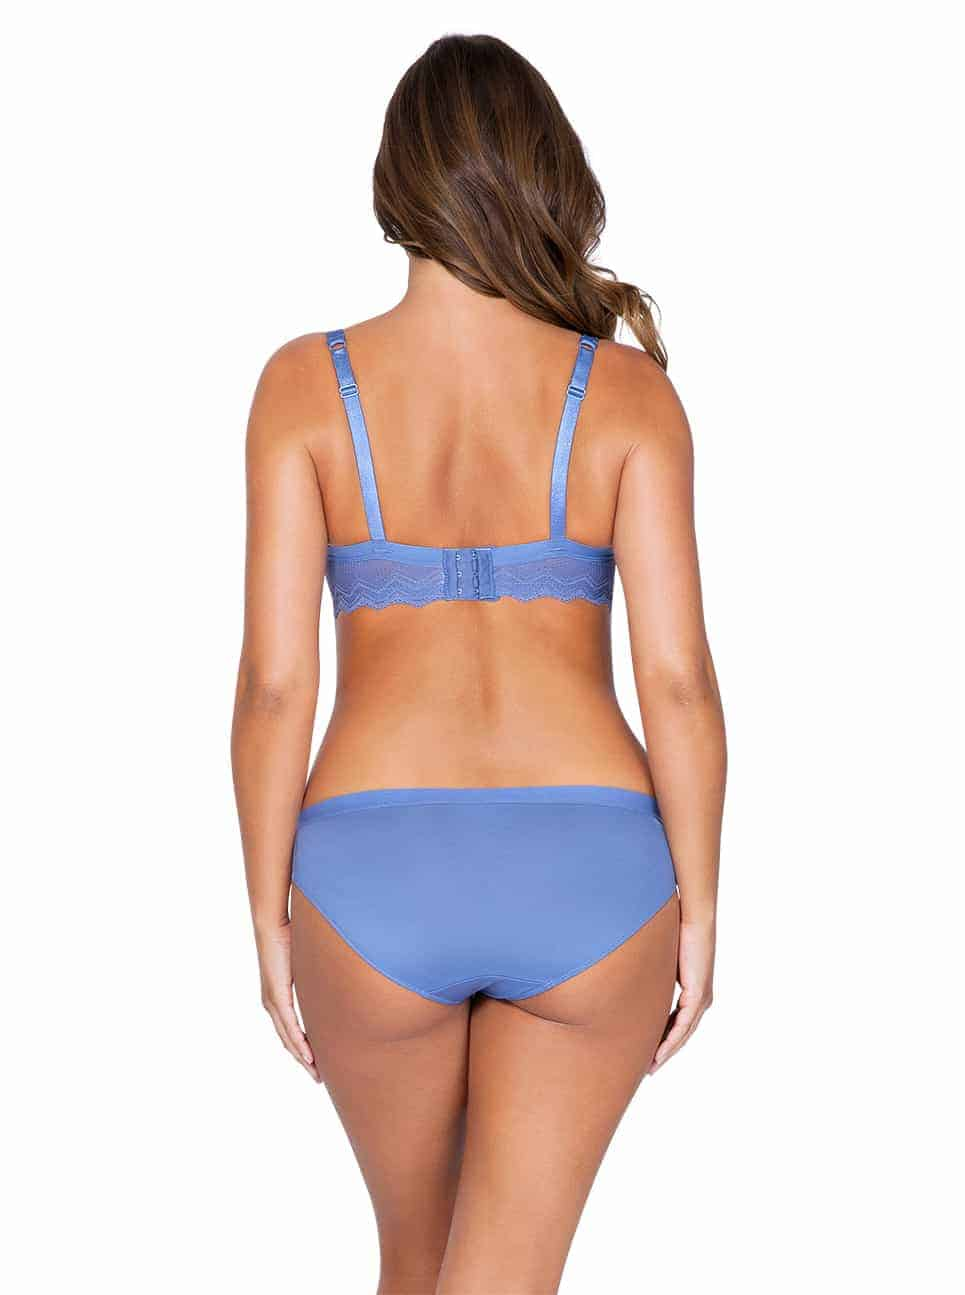 Lydie P5441ContourPadded P5443 Bikini SilverBlueBack - Lydie Bikini – Silver Blue – P5443